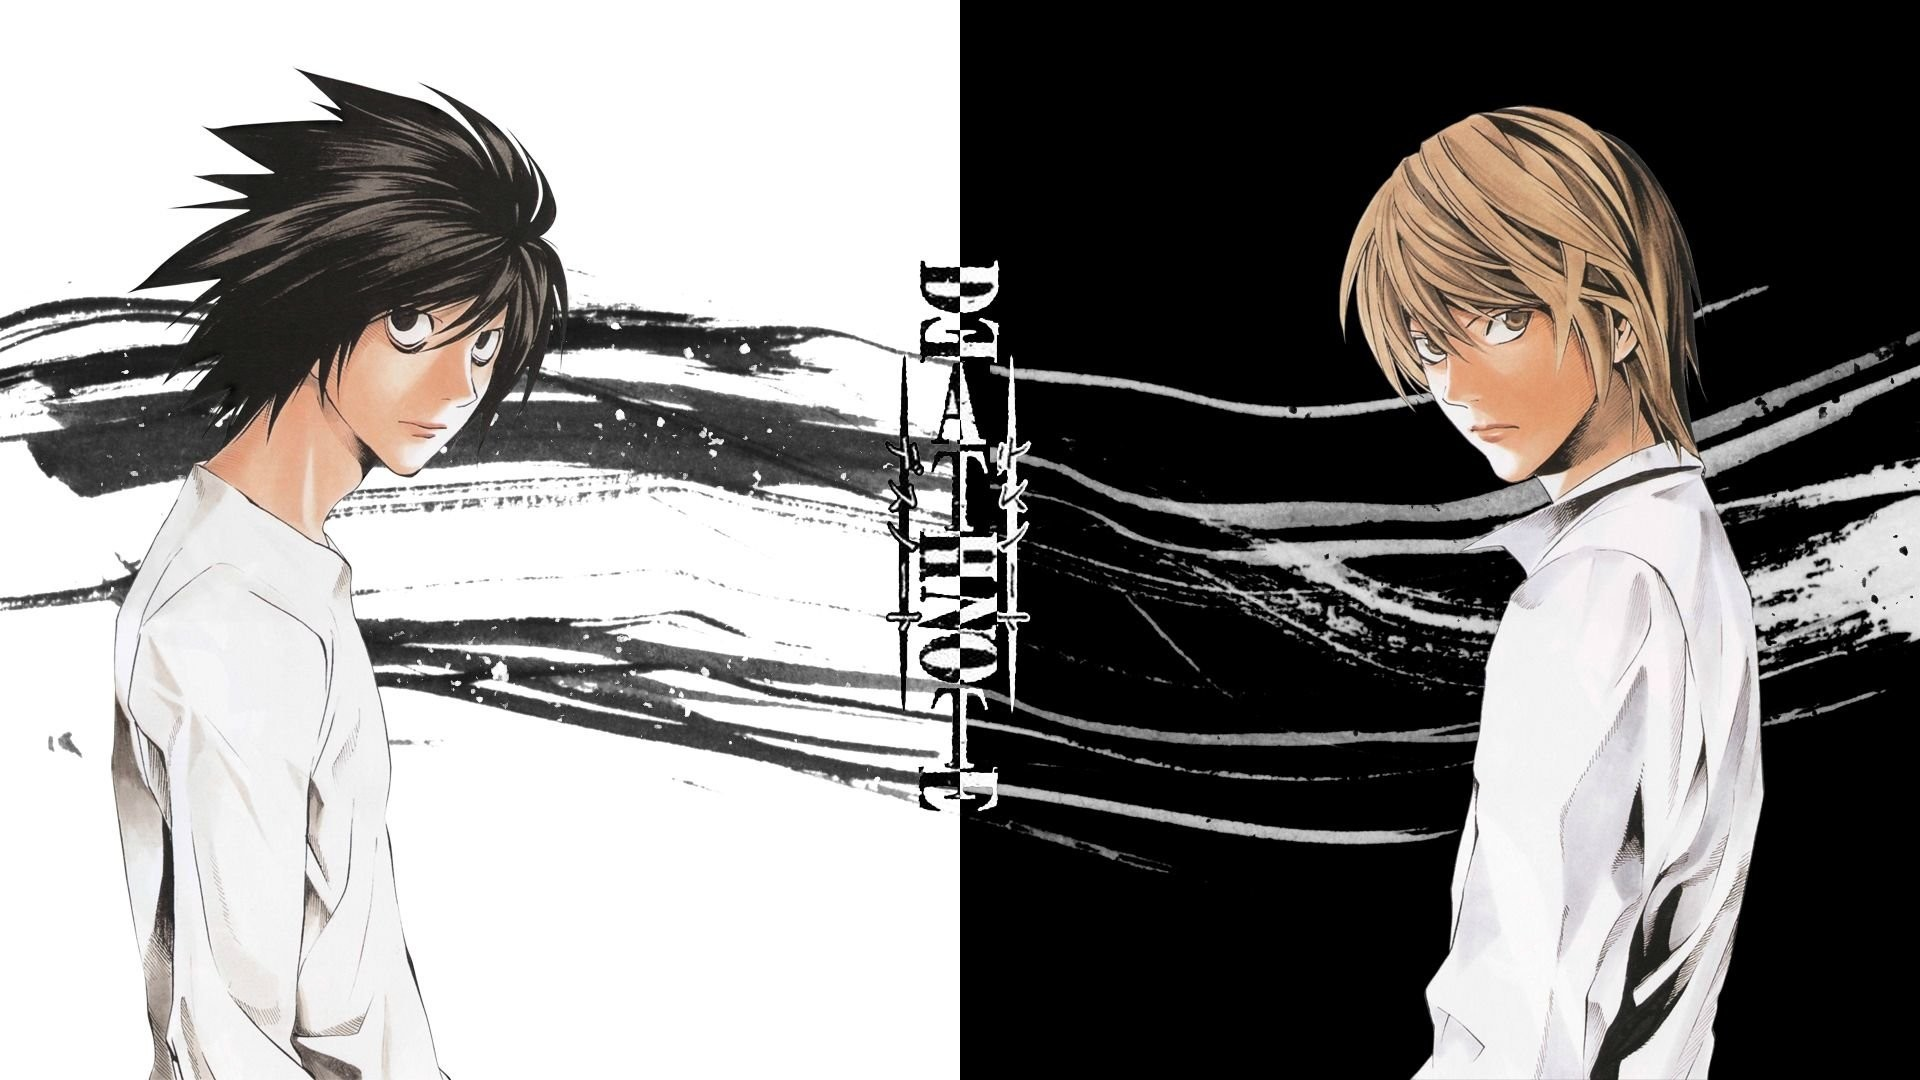 L Death Note Wallpaper Hd (55+ Images